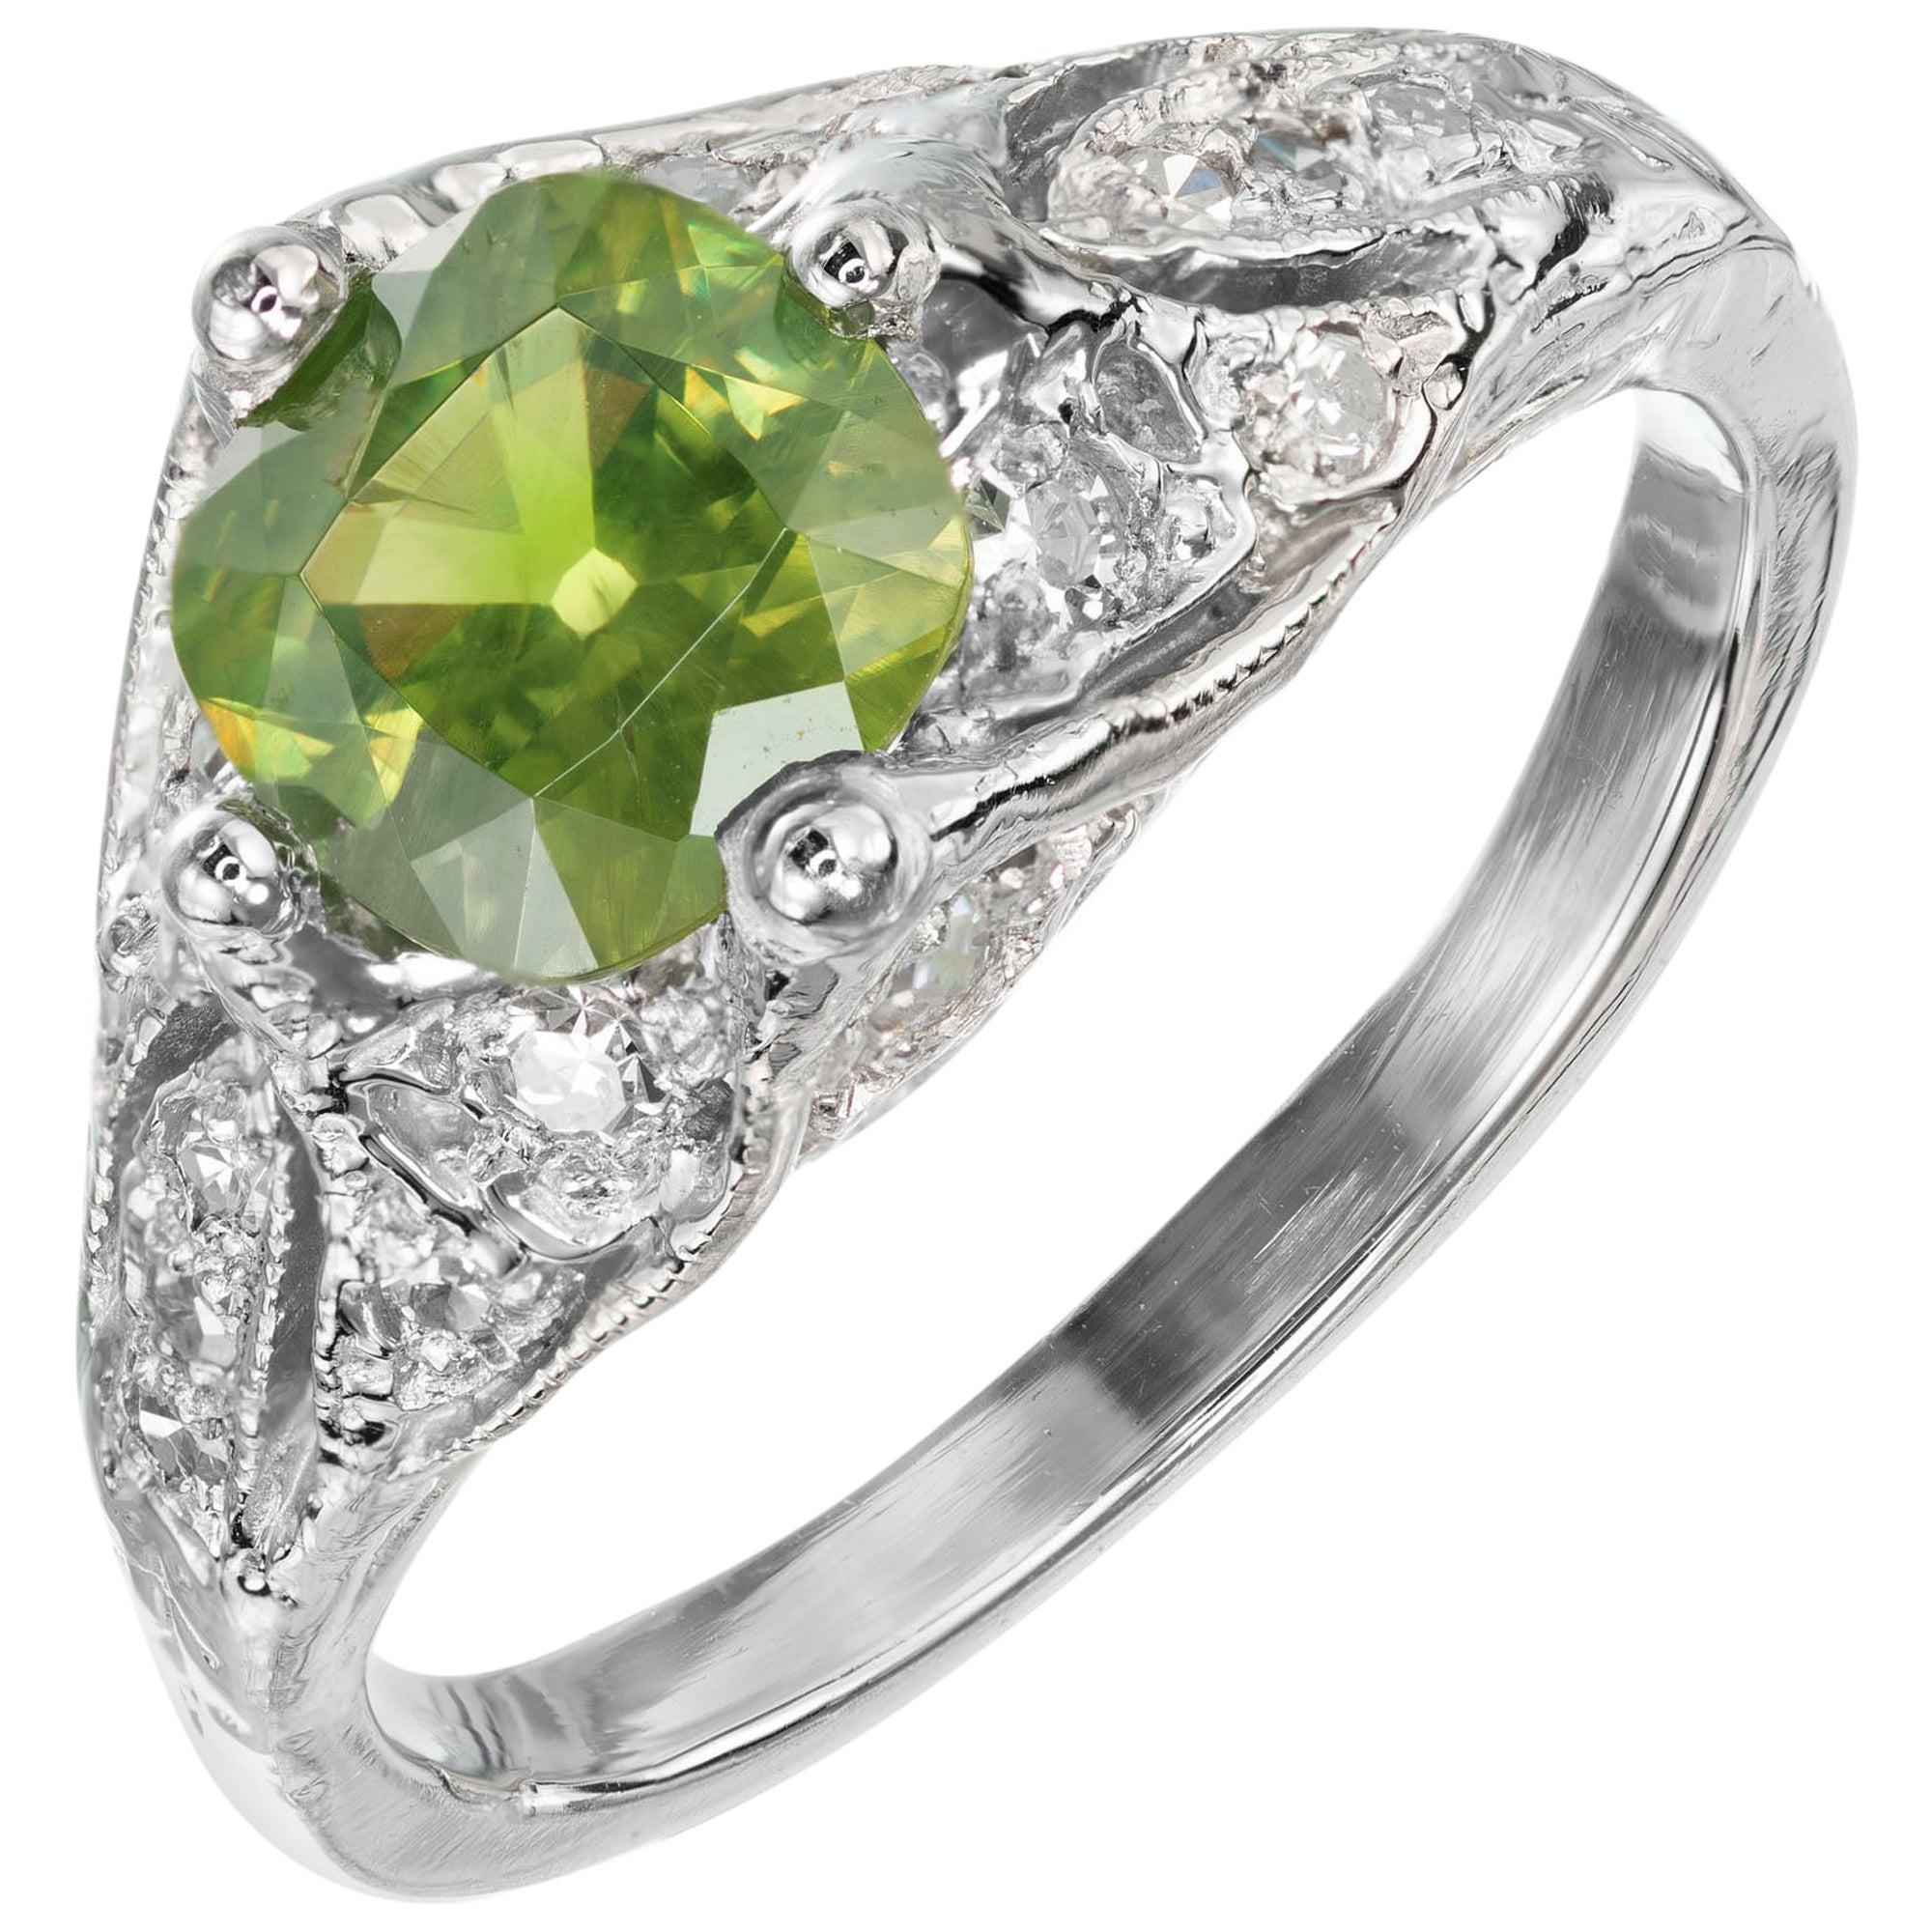 1.04 Carat Green Russ Demantoid Garnet Diamond Platinum Art Deco Engagement Ring